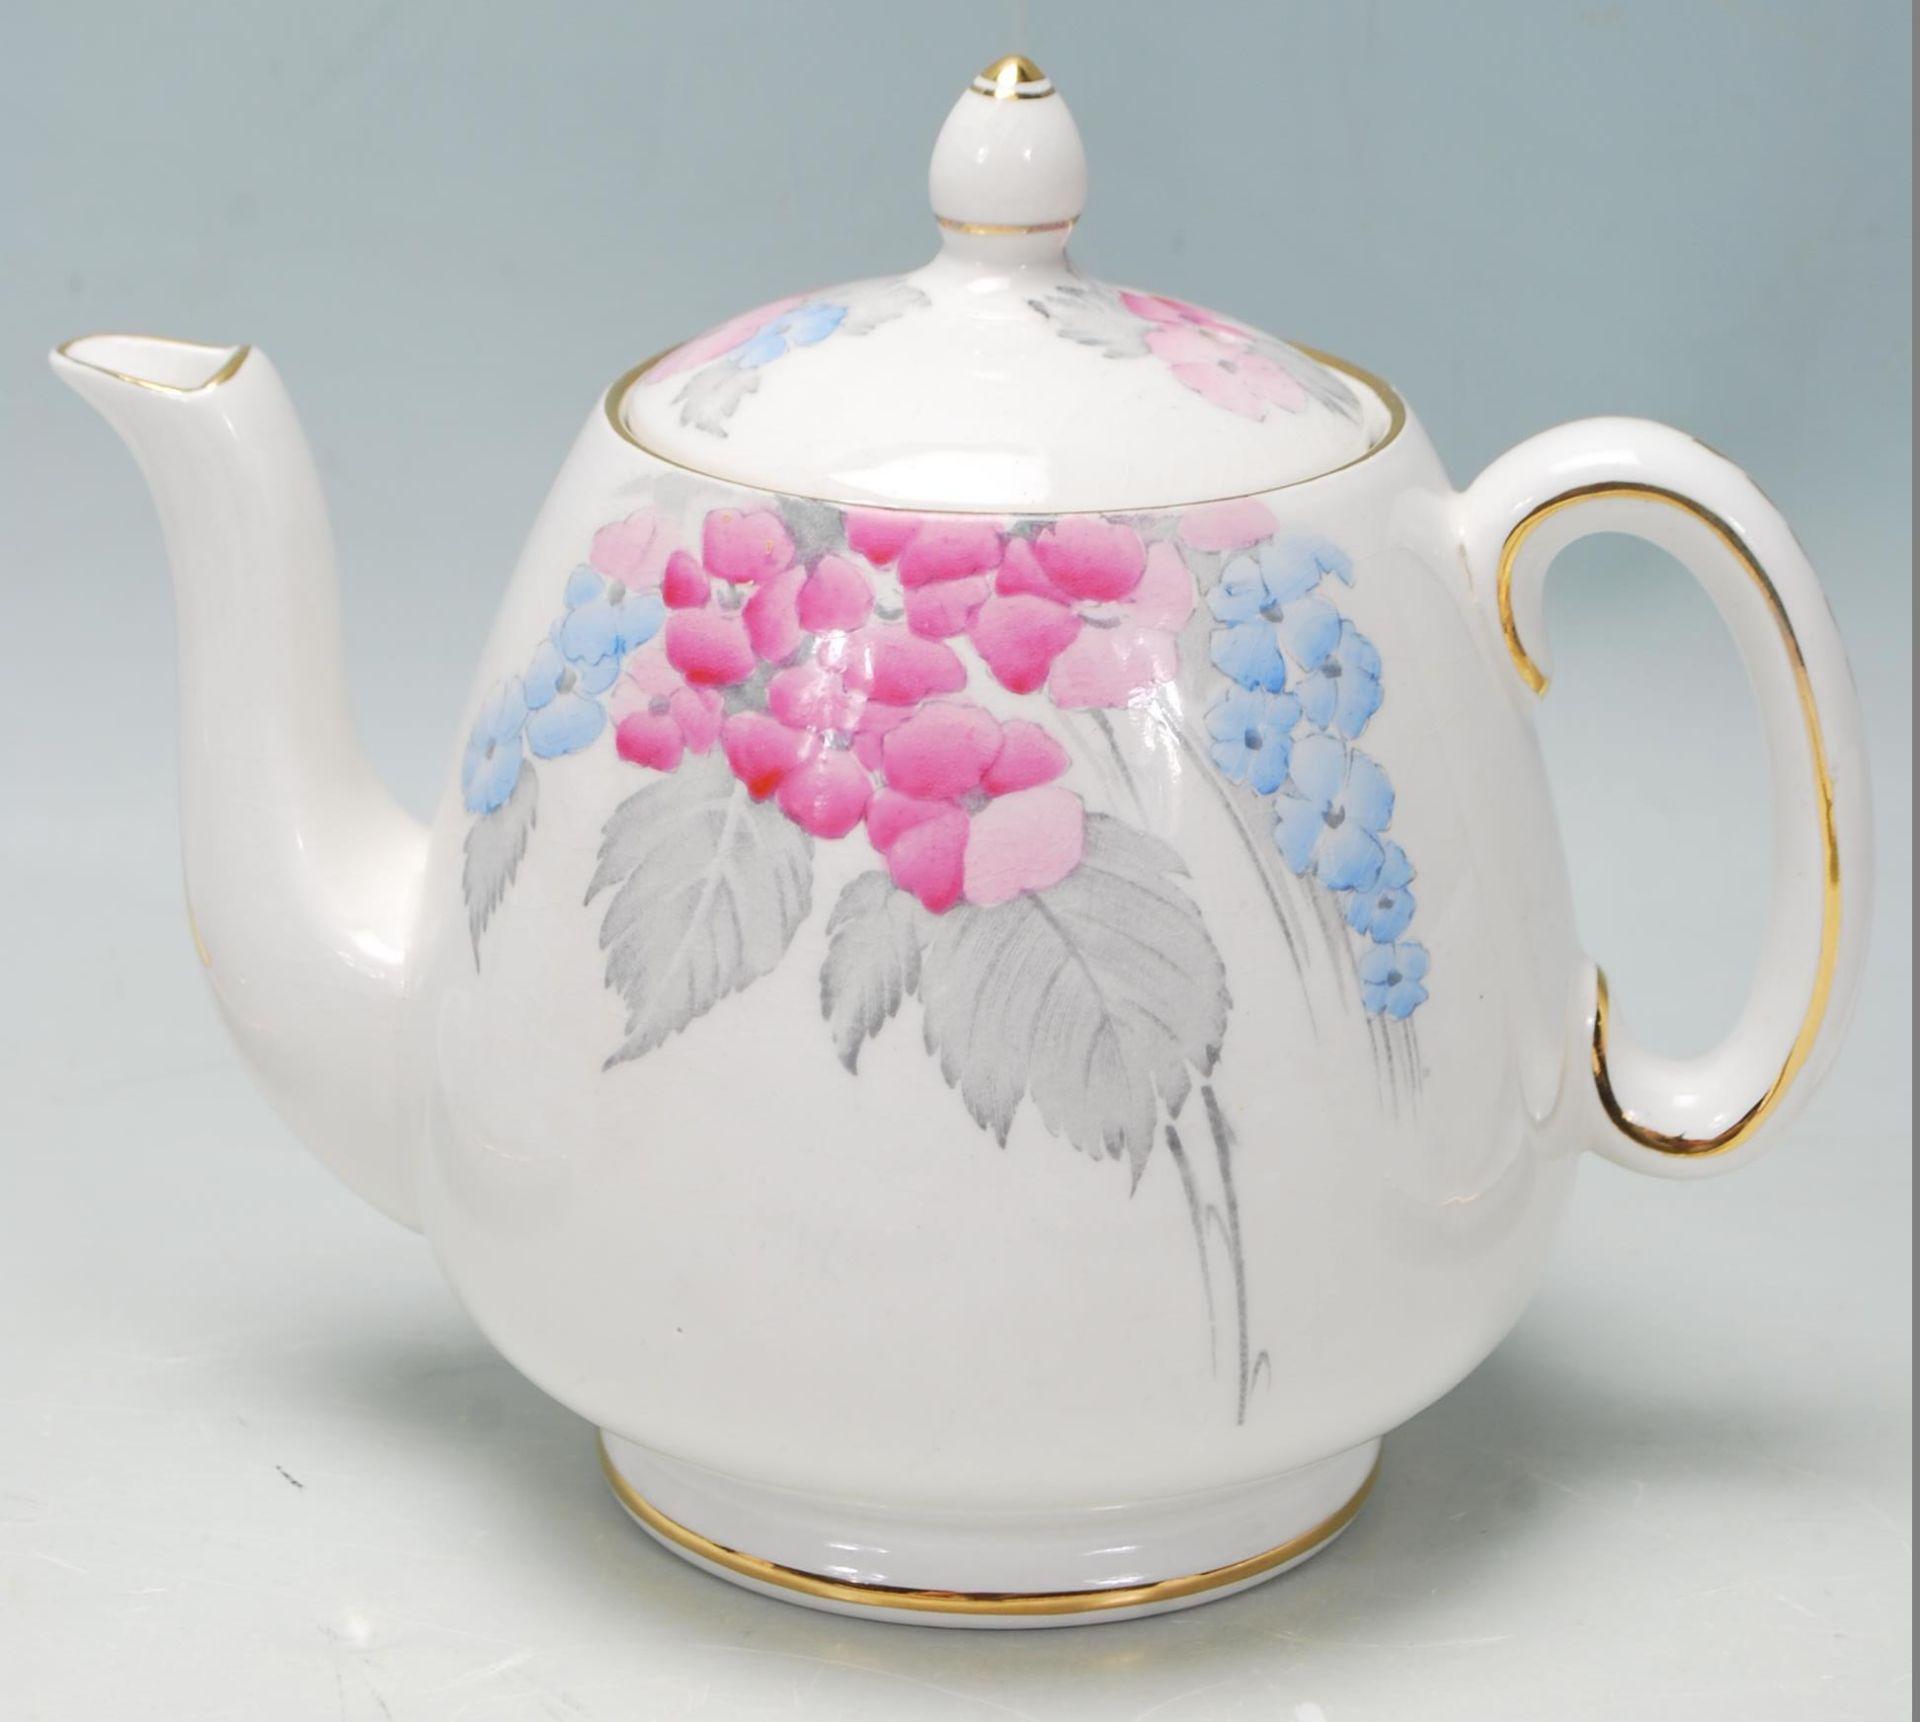 Los 1 - A vintage Art Deco 1930's Shelley bone china tea set / service / tea for two breakfast set being